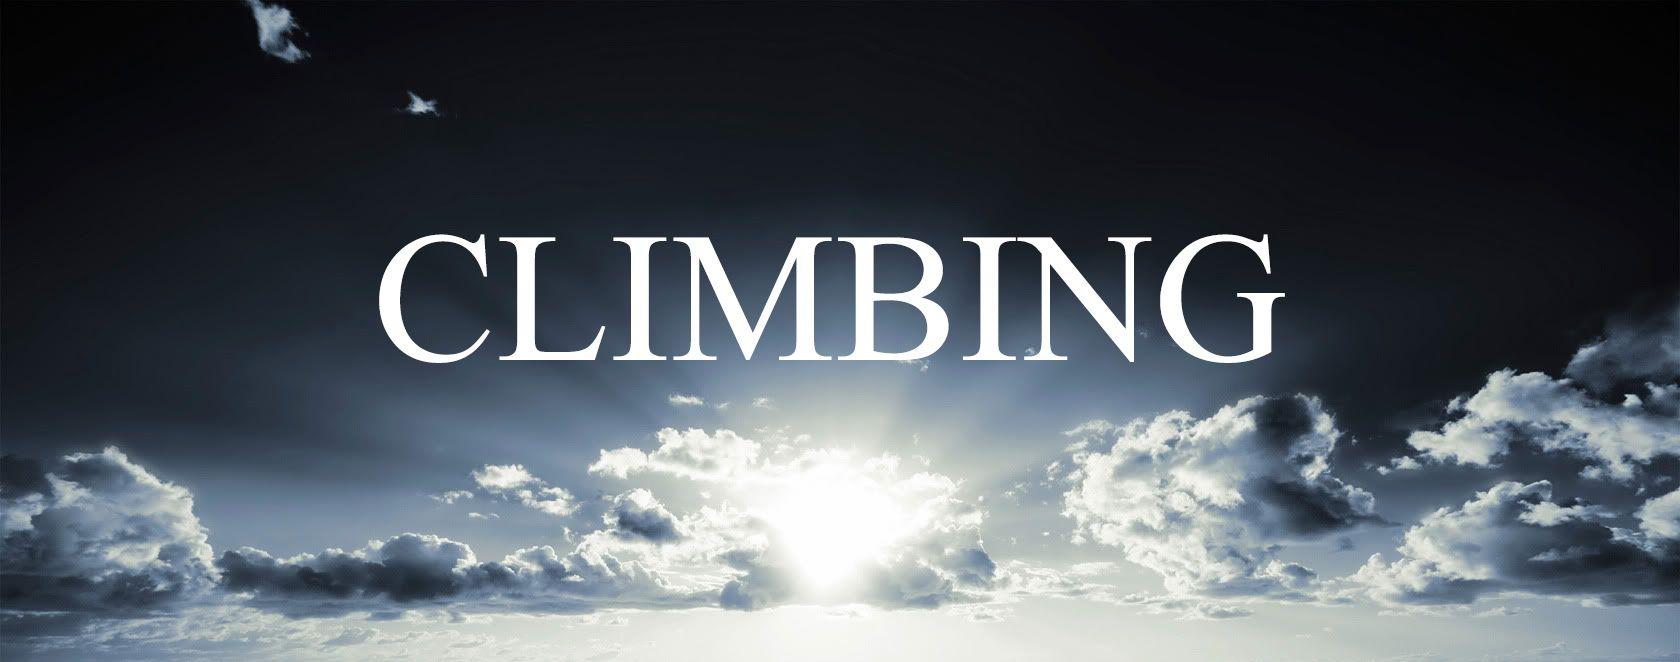 Climbing - Lord 909